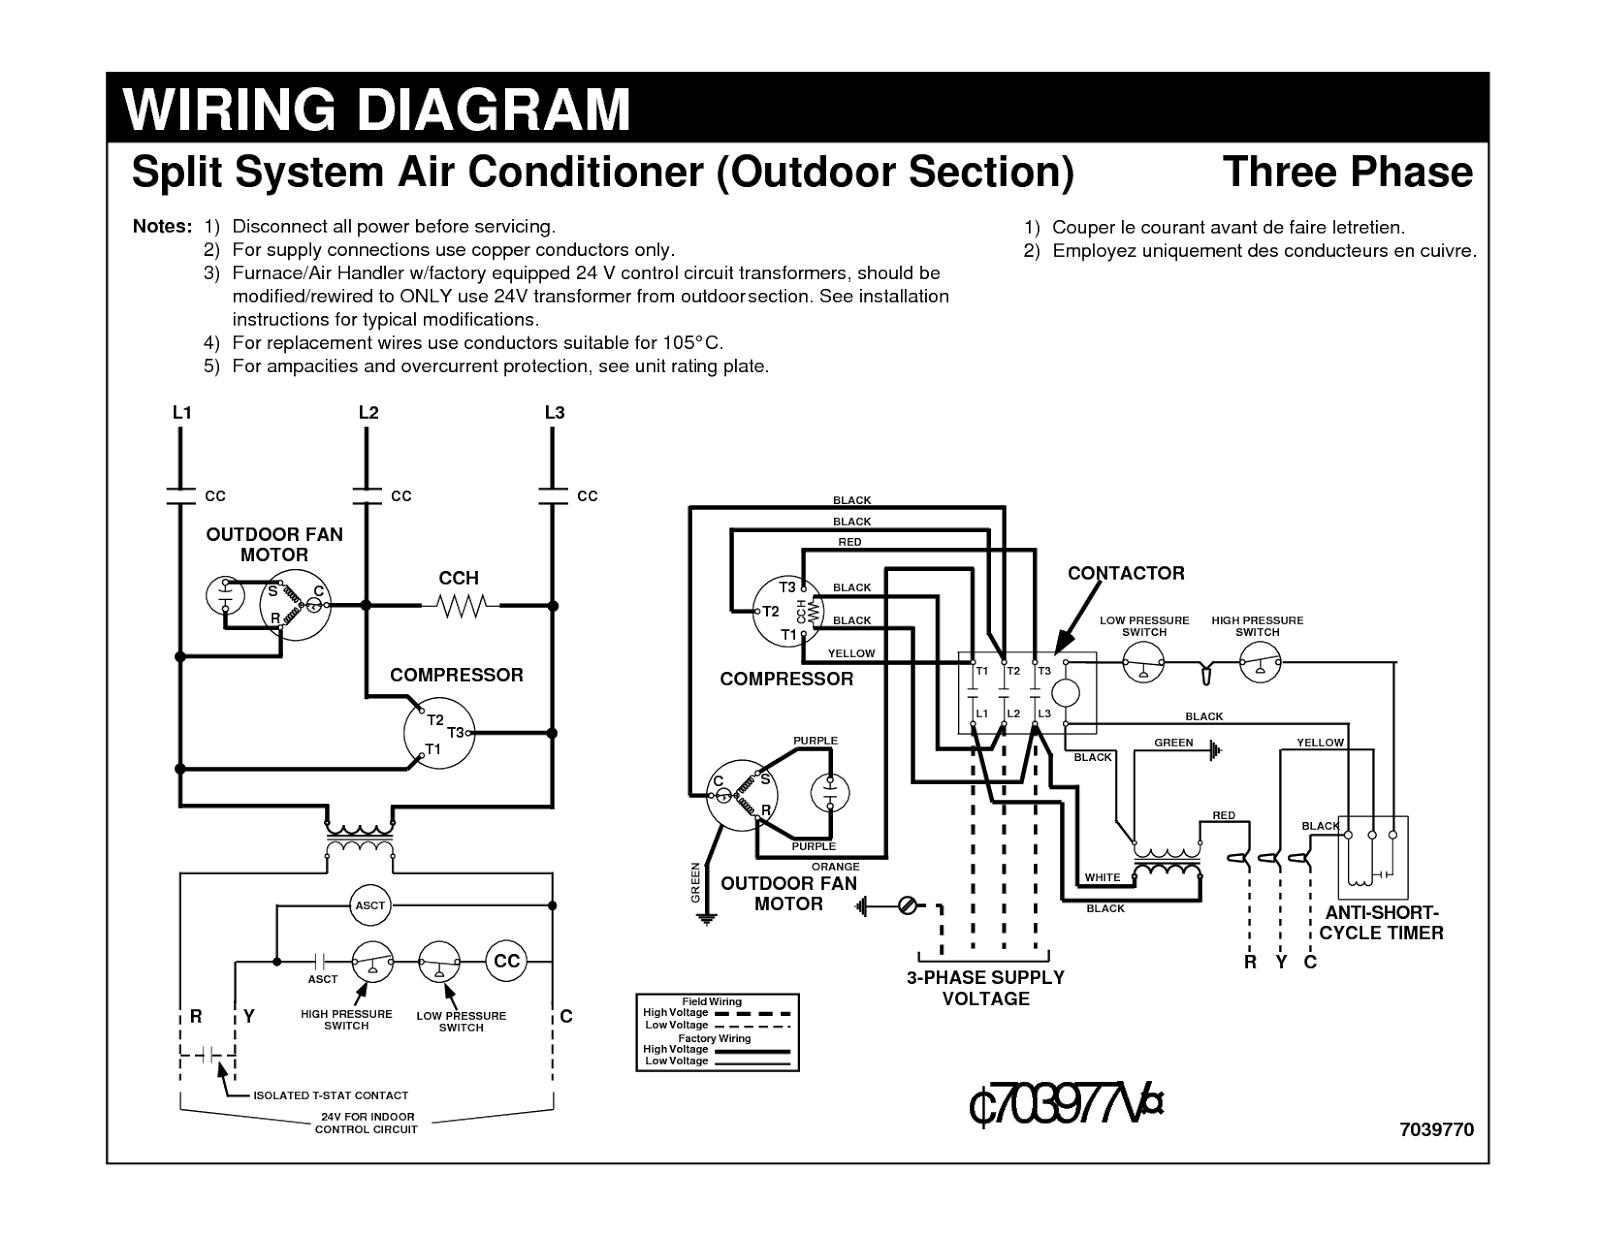 Ac Schematic Wiring - Wiring Diagram Data Oreo - Air Conditioner Wiring Diagram